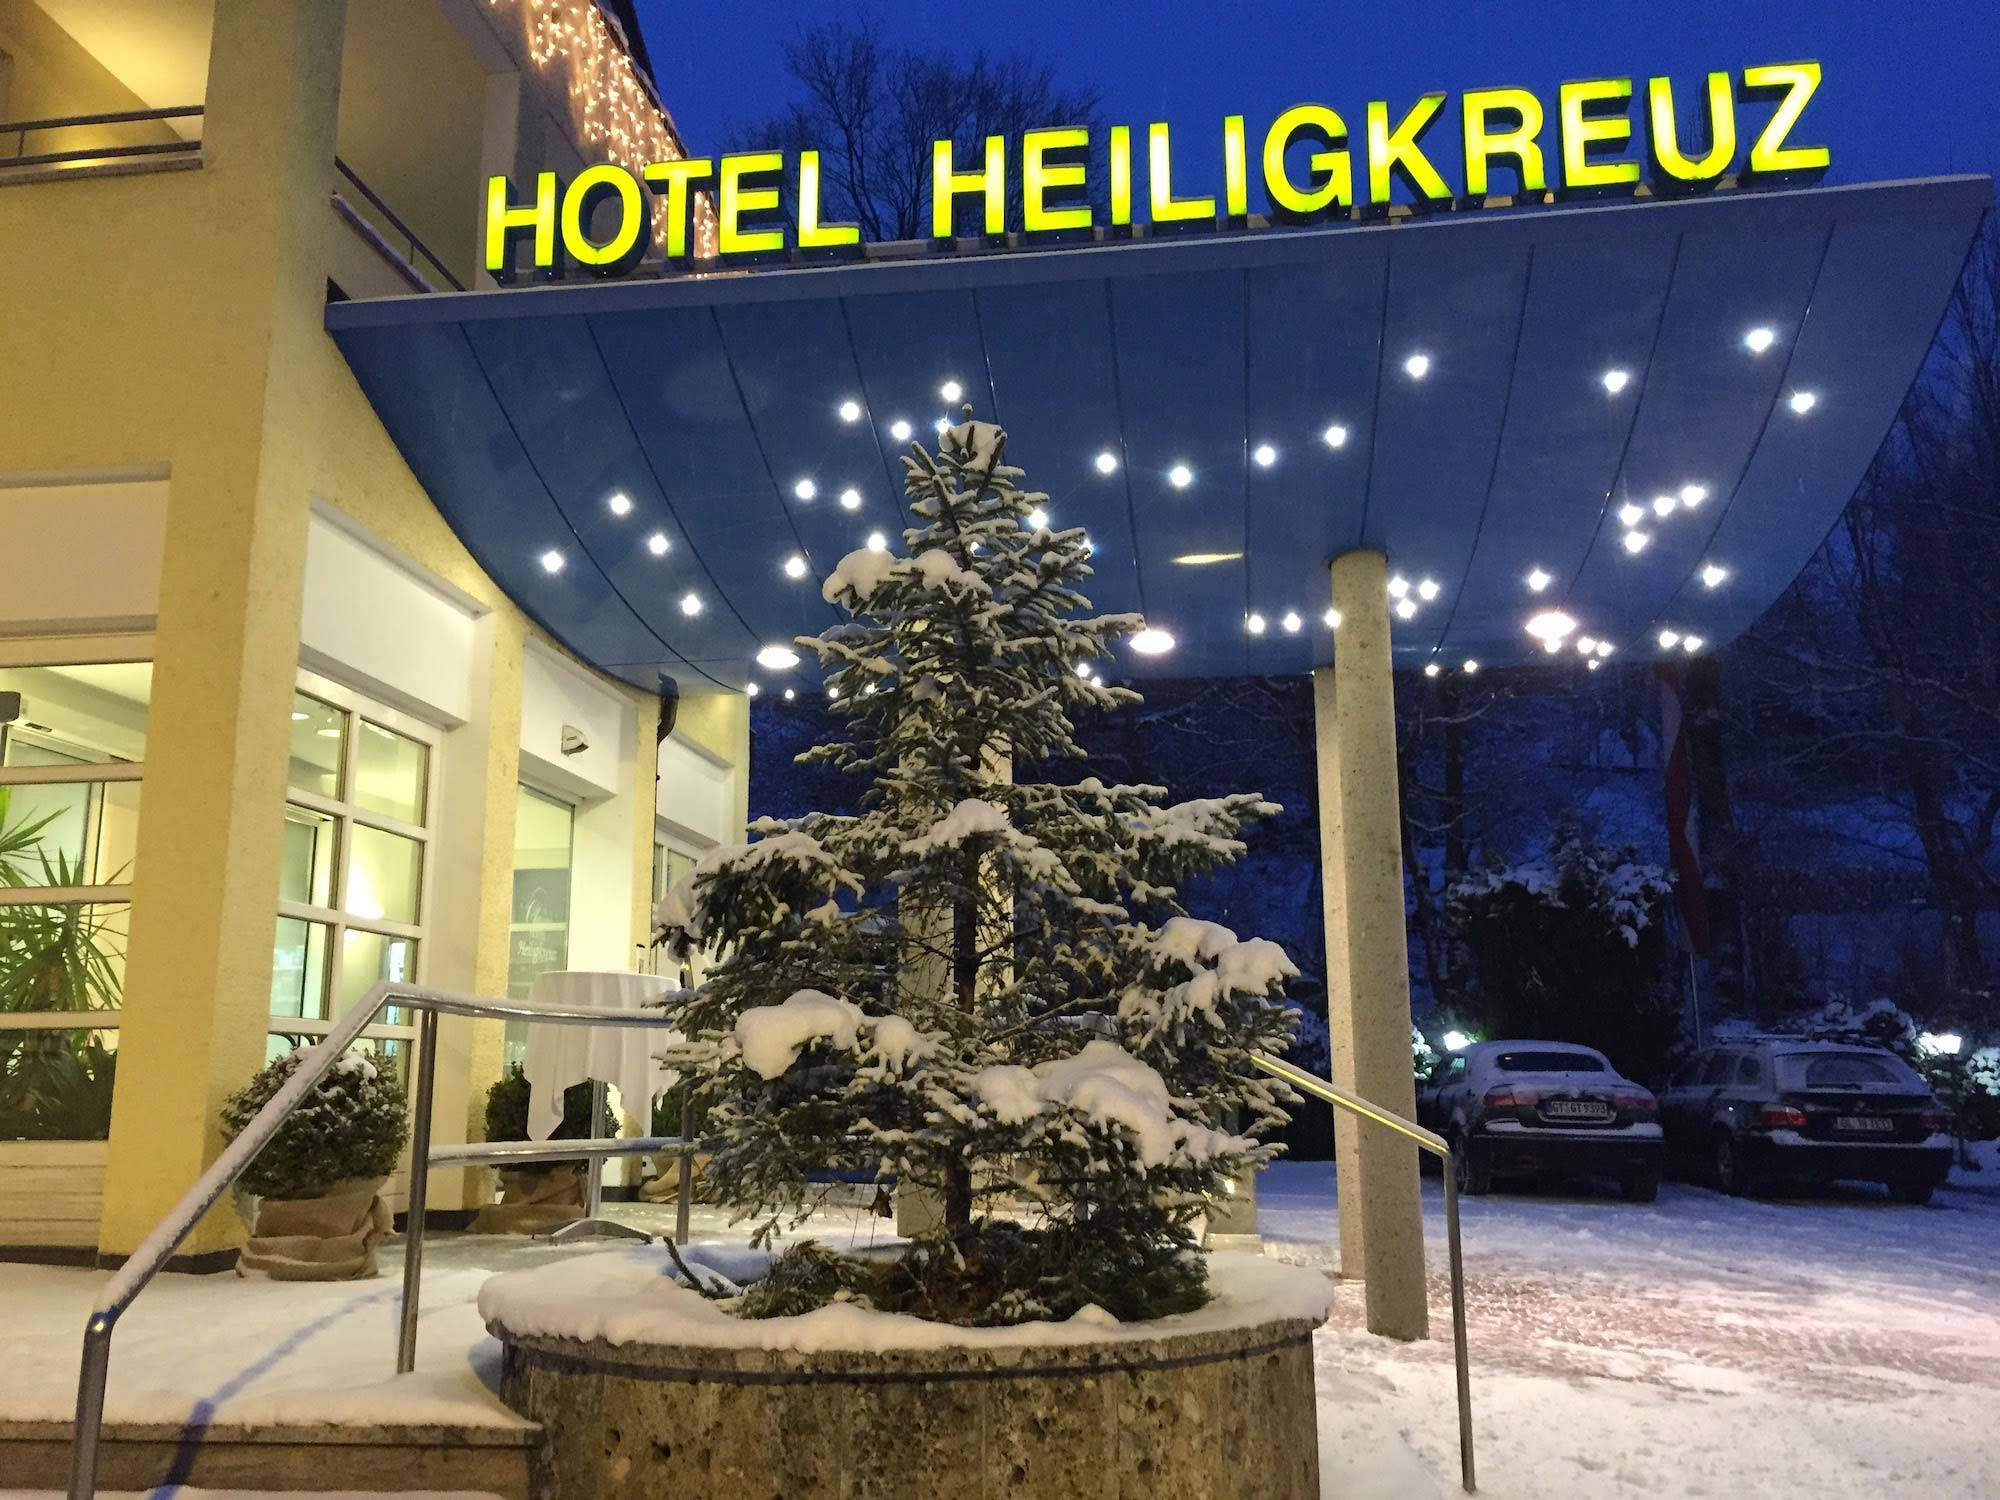 Winter Eingang Hotel Heiligkreuz Hall bei Innsbruck